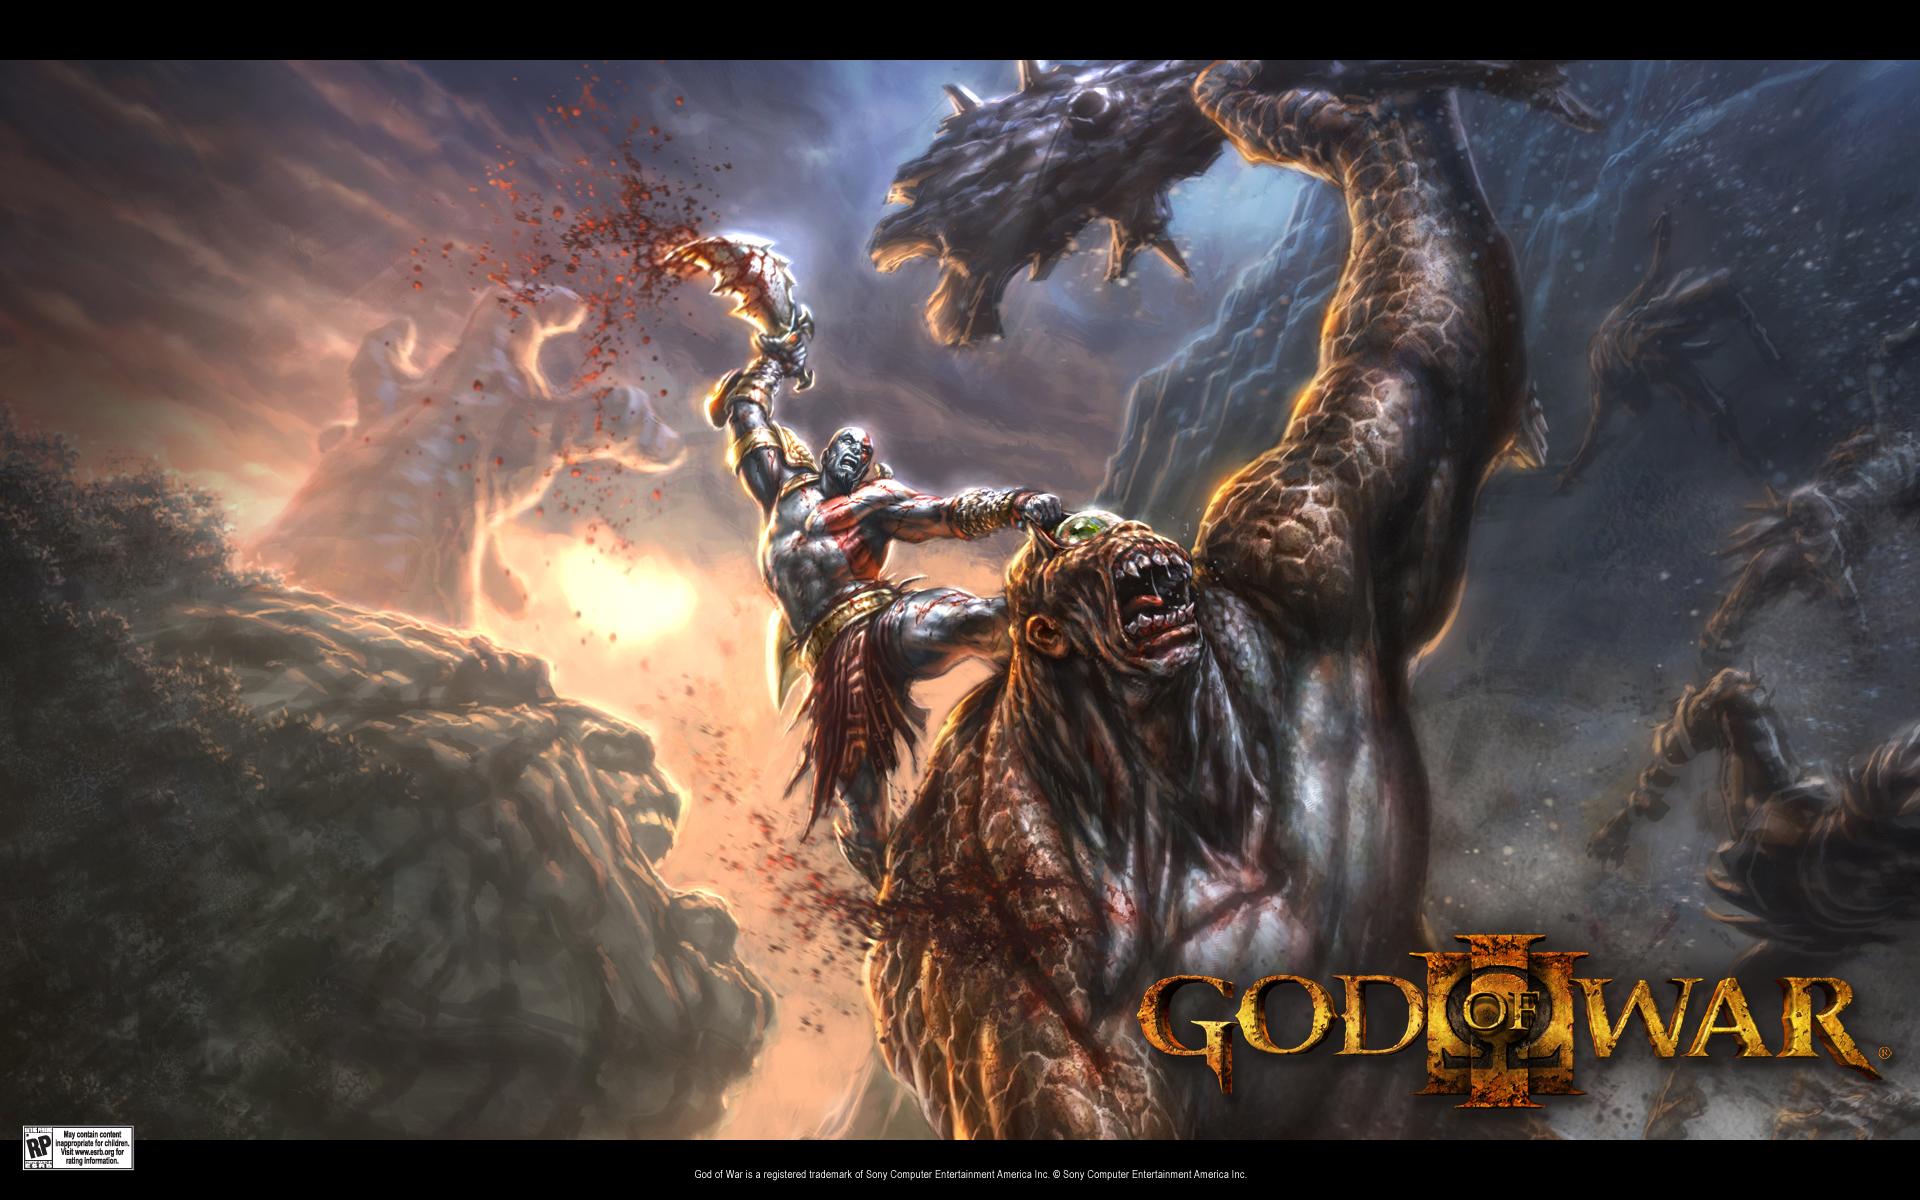 Free Download God Of War Wallpaper Hd Wallpaper 20044 1920x1200